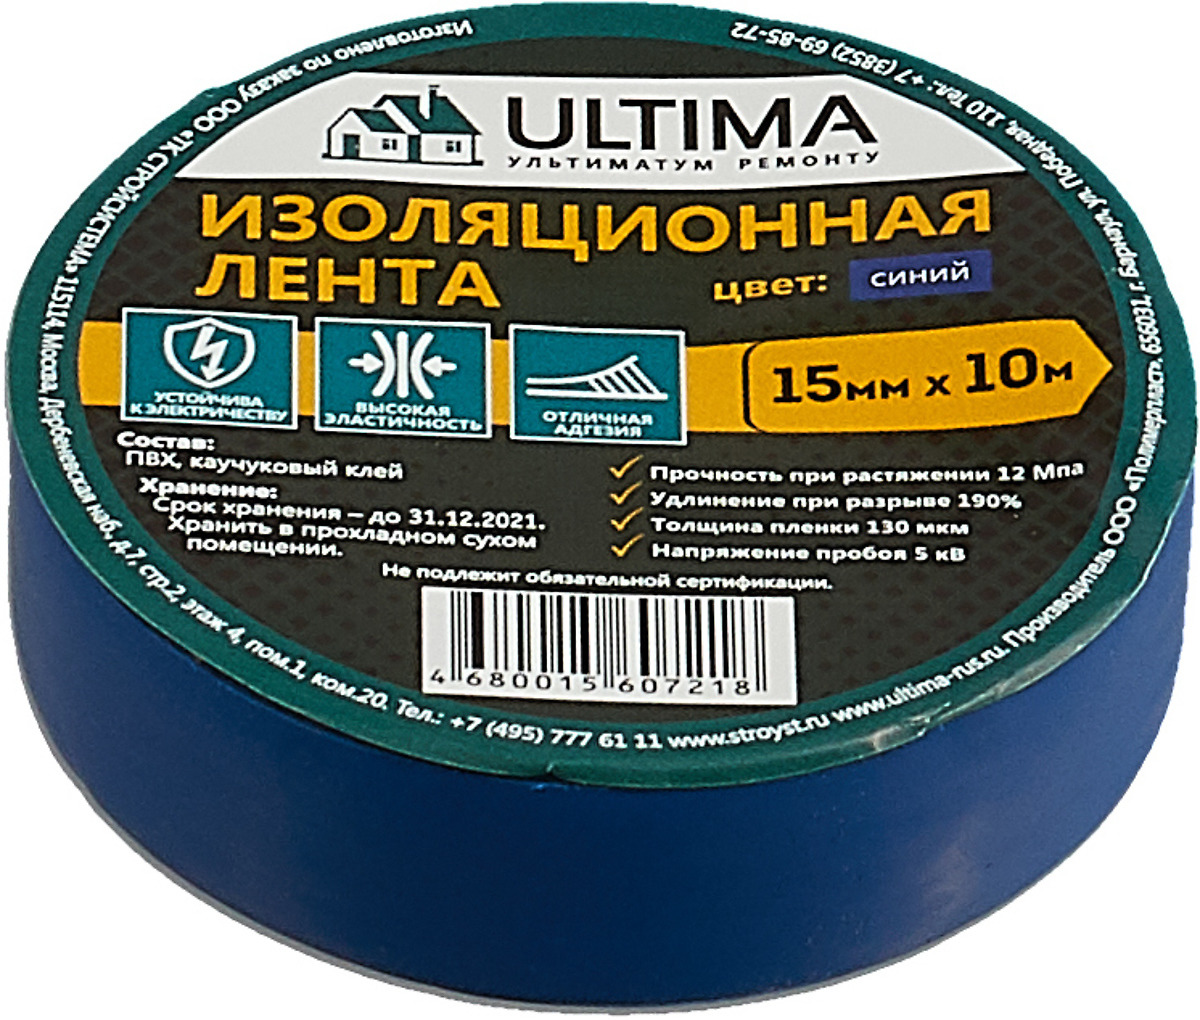 Лента изоляционная Ultima, цвет: синий, 15 мм, 10 м